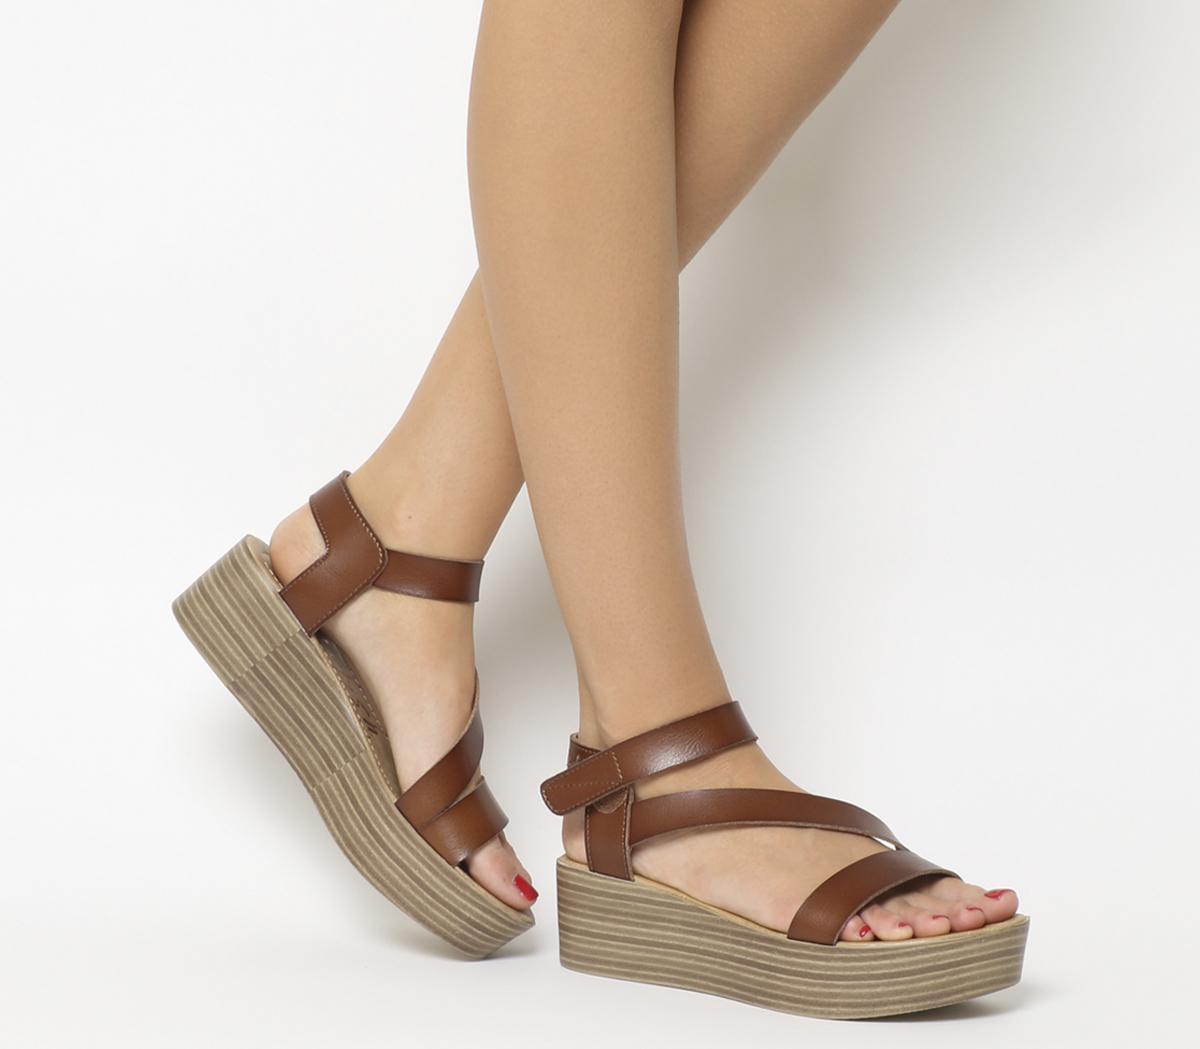 Blowfish Malibu Lover Flatform Sandals